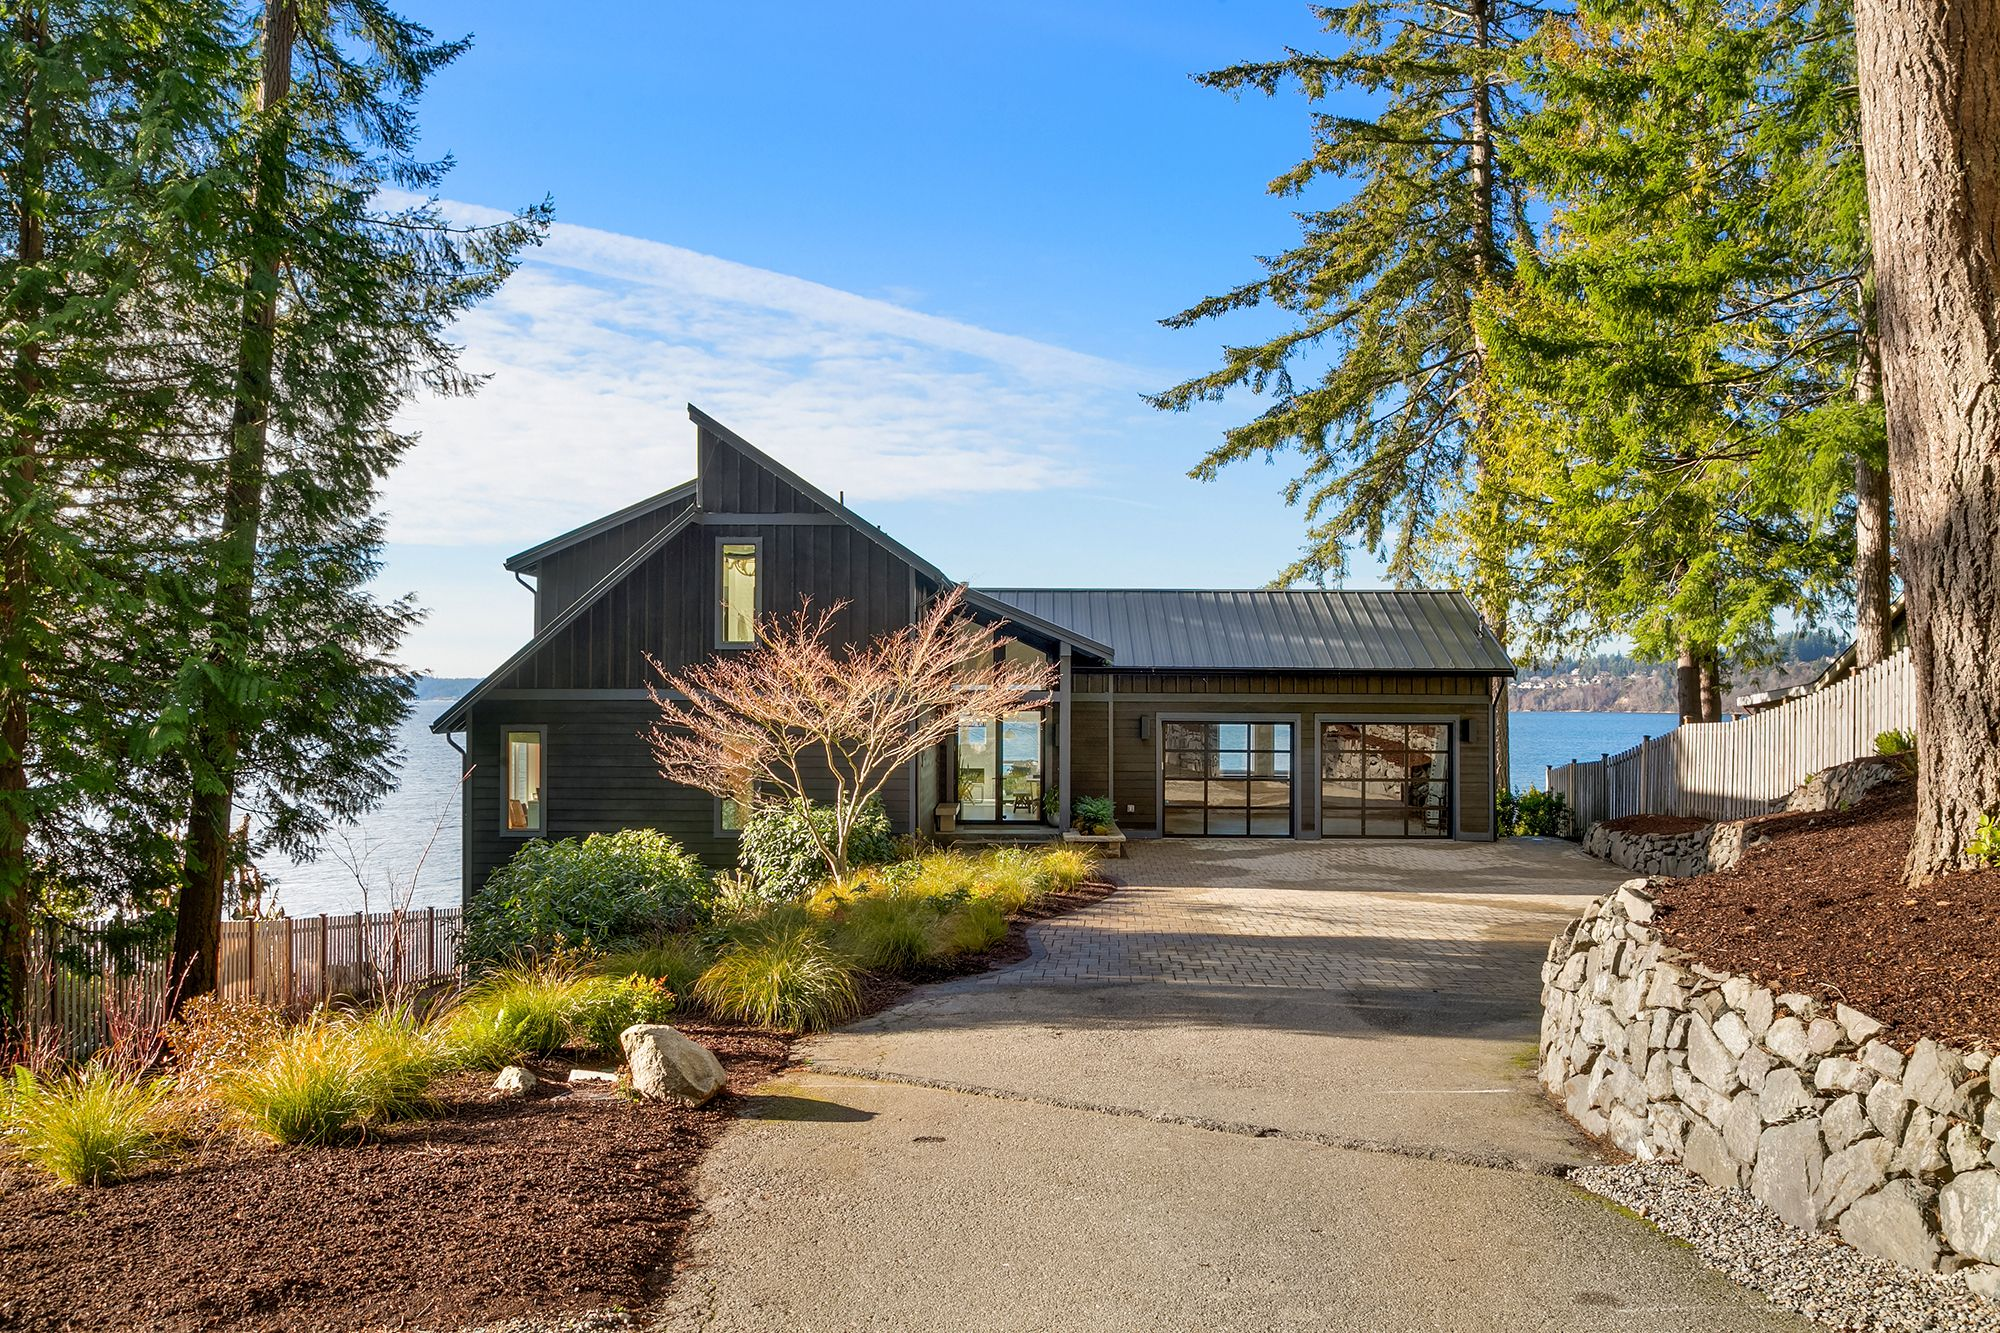 Casa ganadora del HGTV's Dream Home 2018